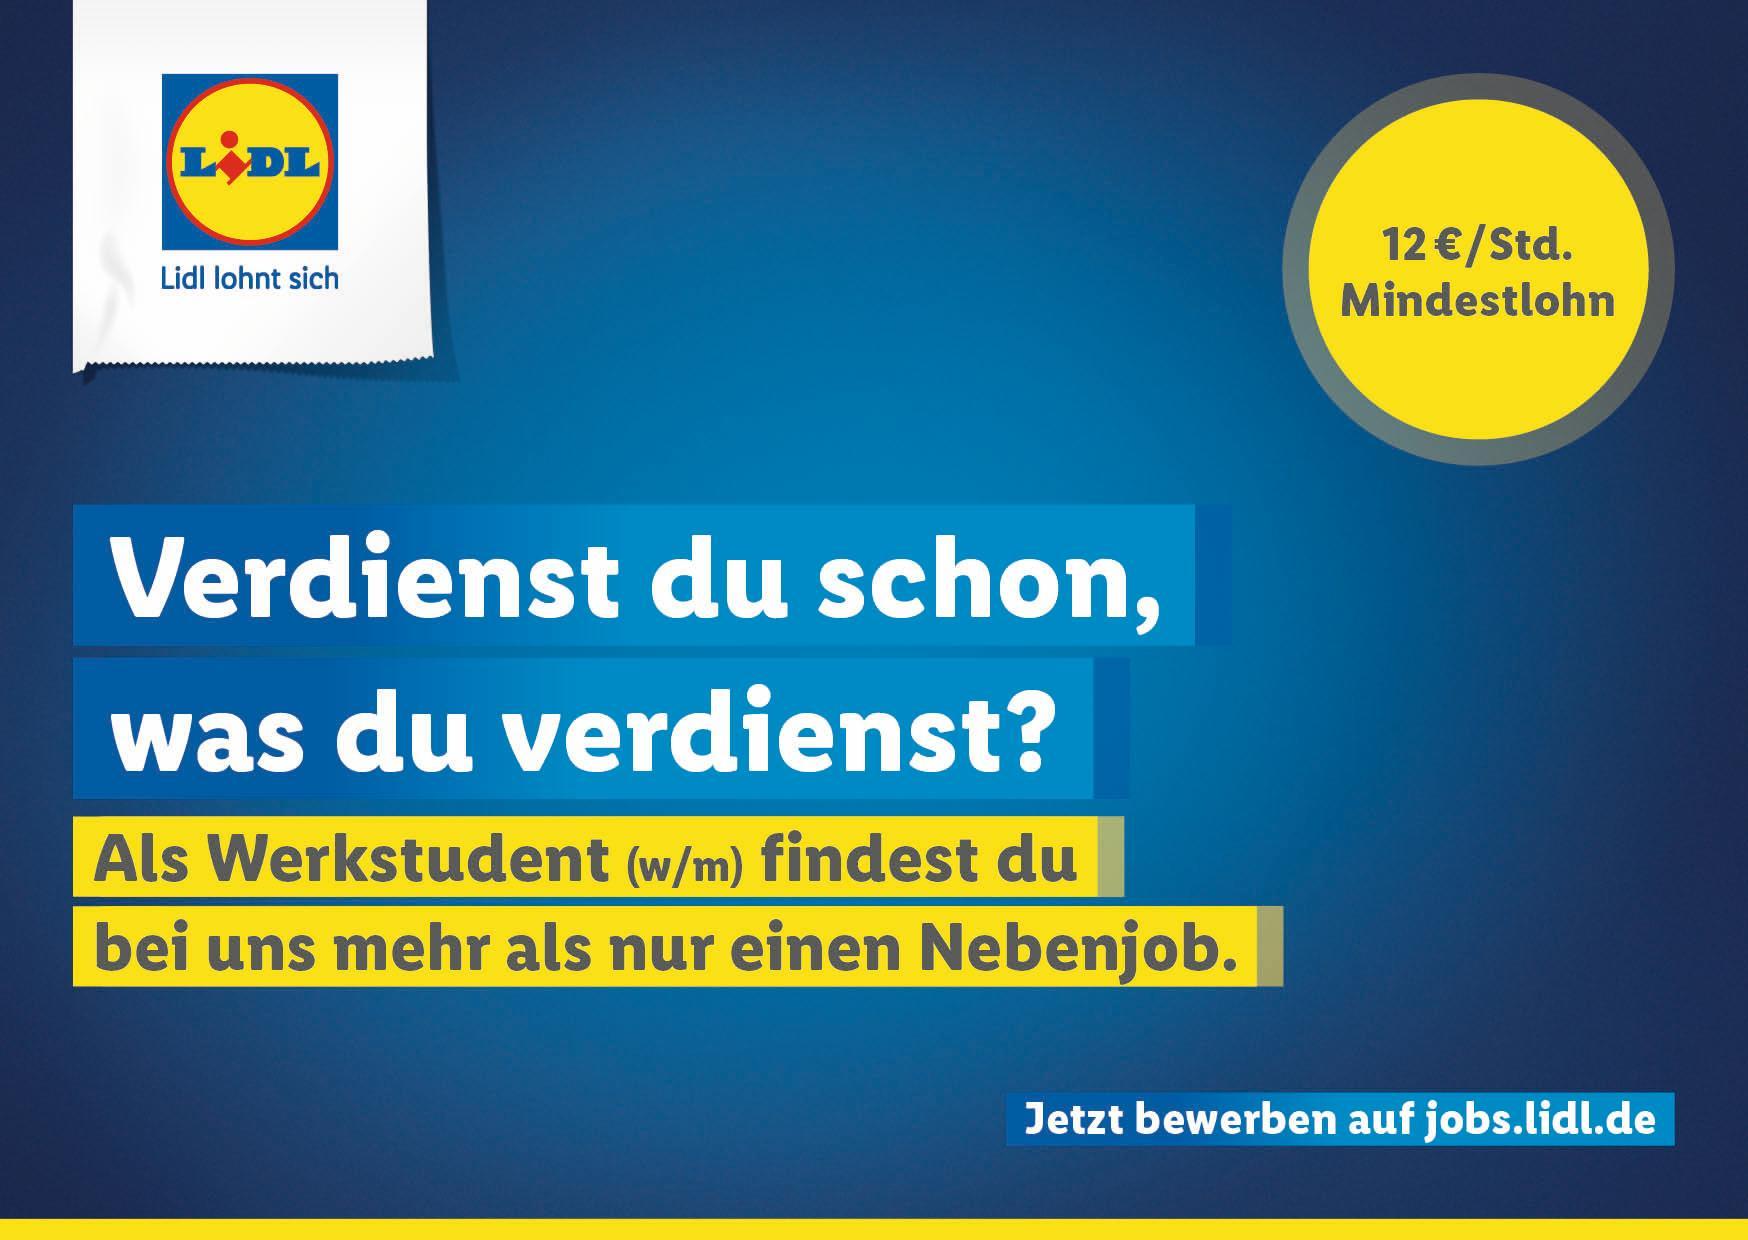 lidl schafft ber 500 neue jobs in frankfurt und umgebung - Lidl Online Bewerbung